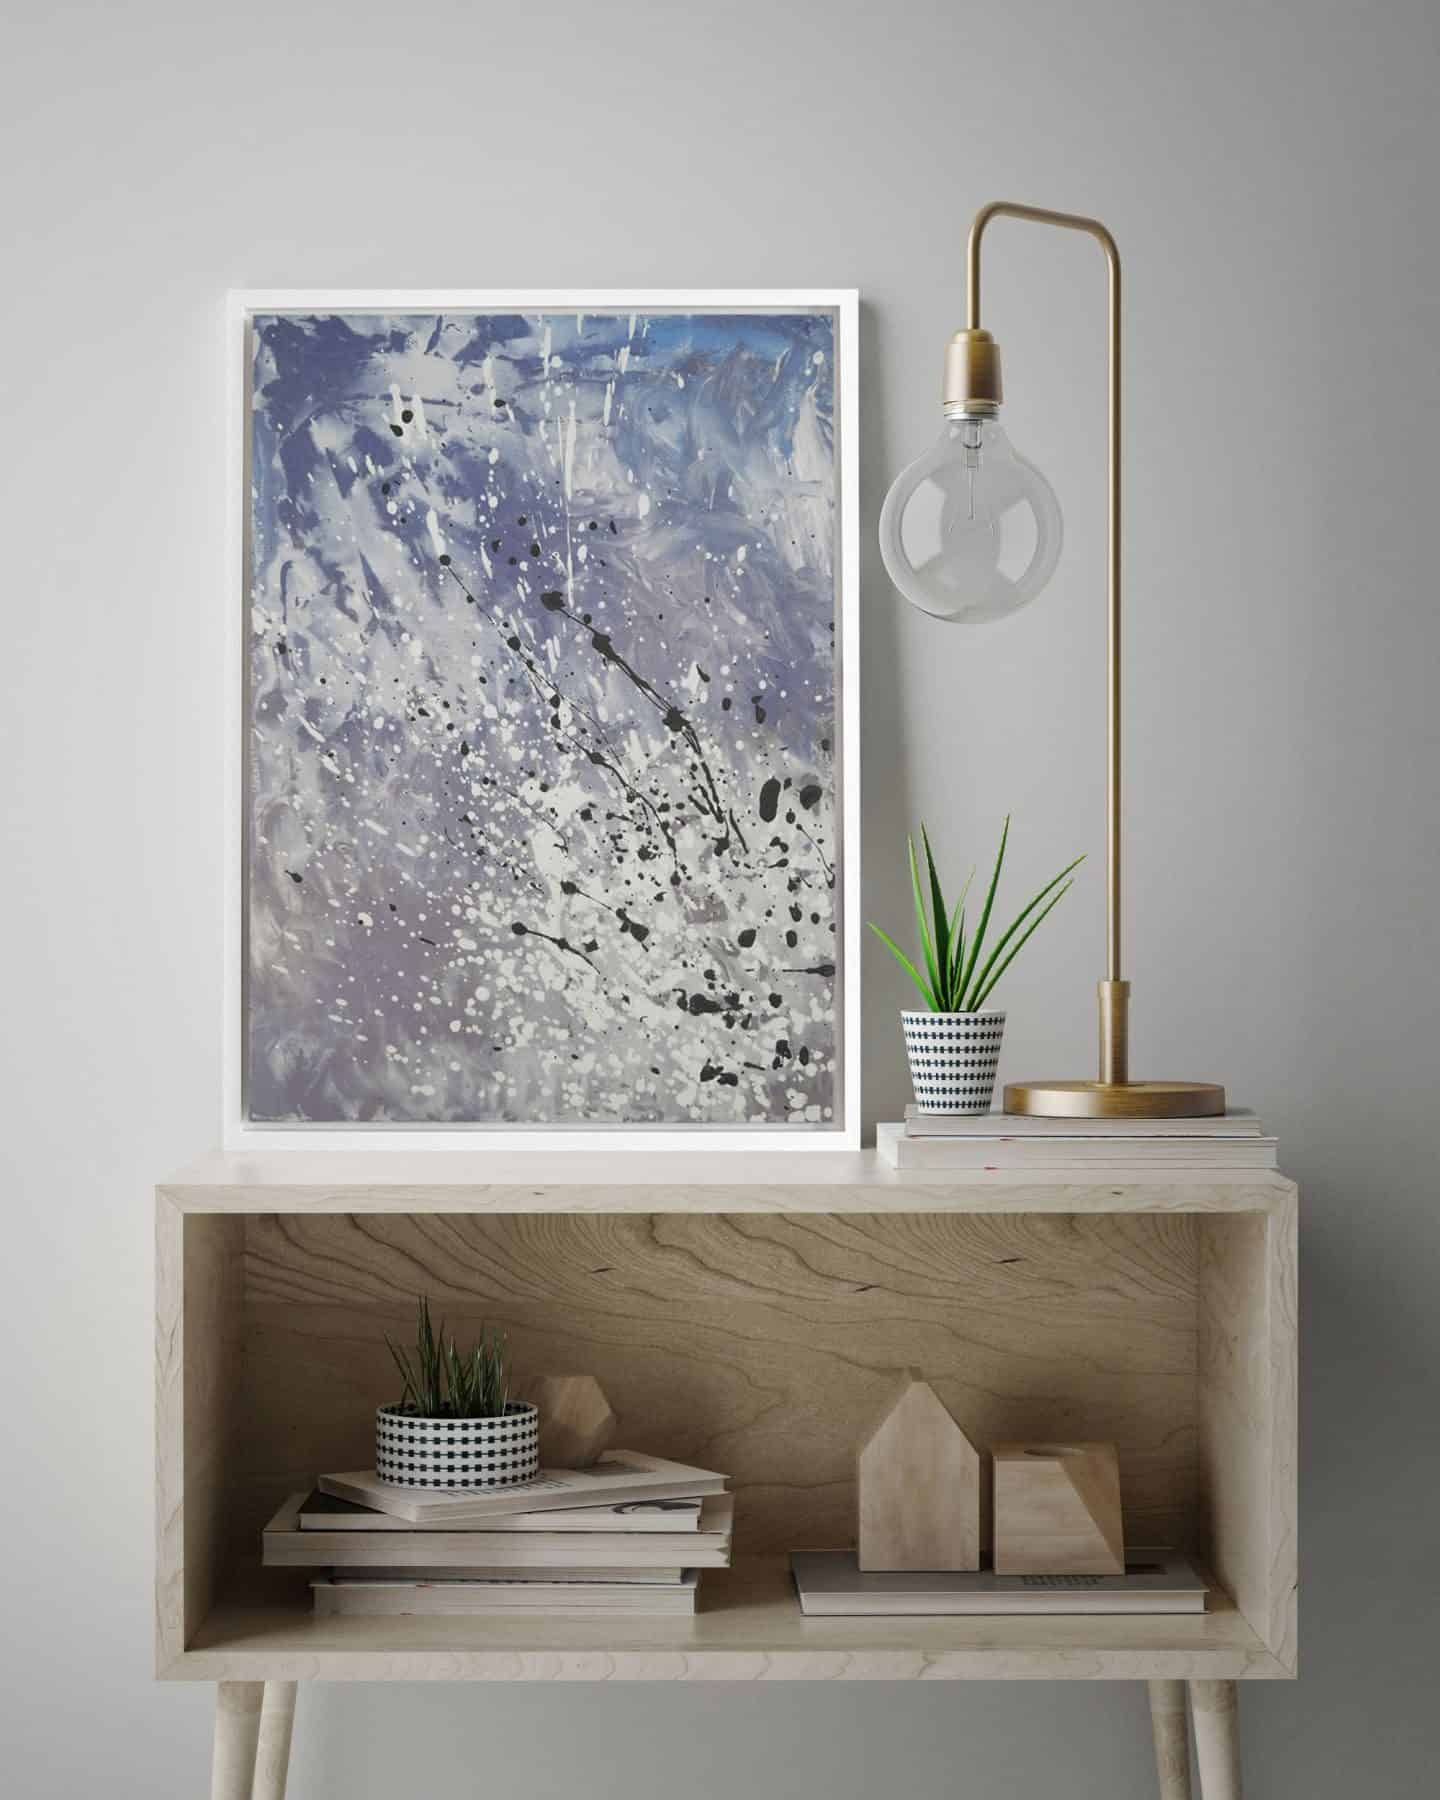 Airo Cool_Canvas Print_Blue & Grey - Attiko Art - abstract wall art print